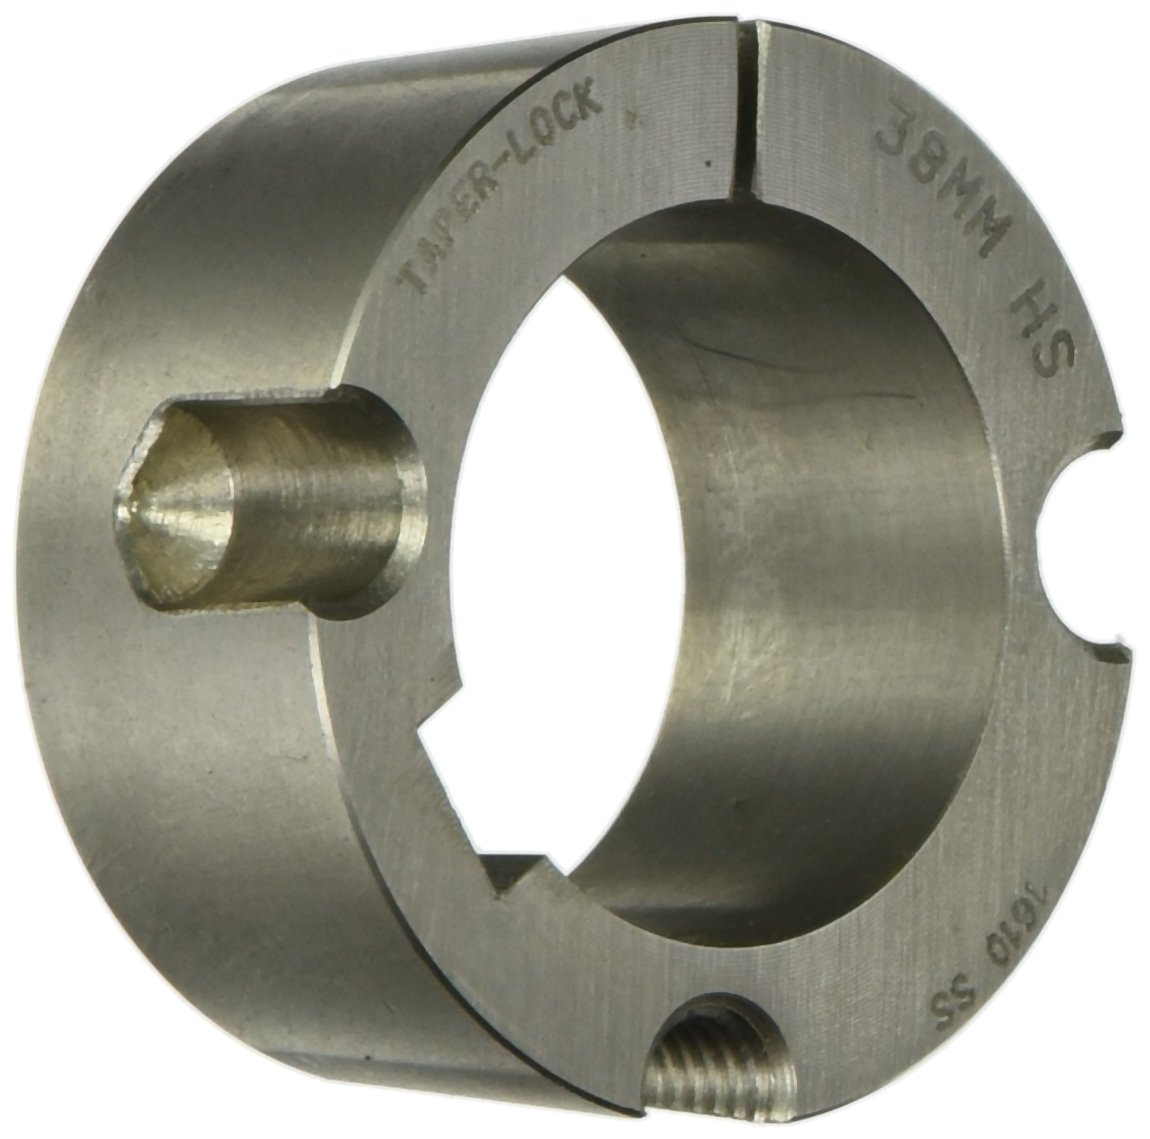 Gates SS 1610 taper-lock de acero inoxidable de 38 mm, 38 mm ...